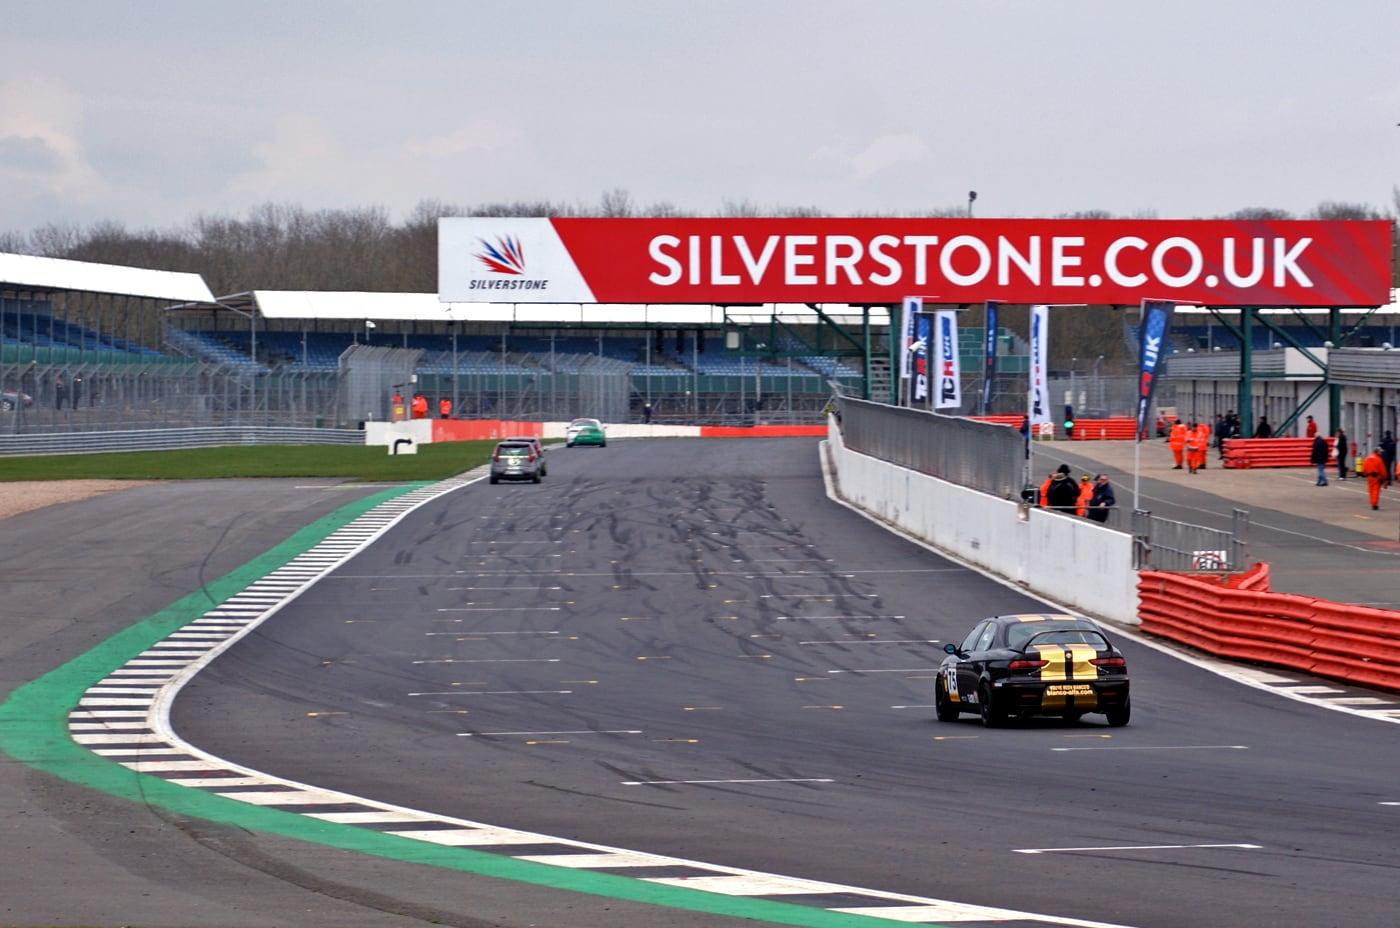 Silverstone 2018